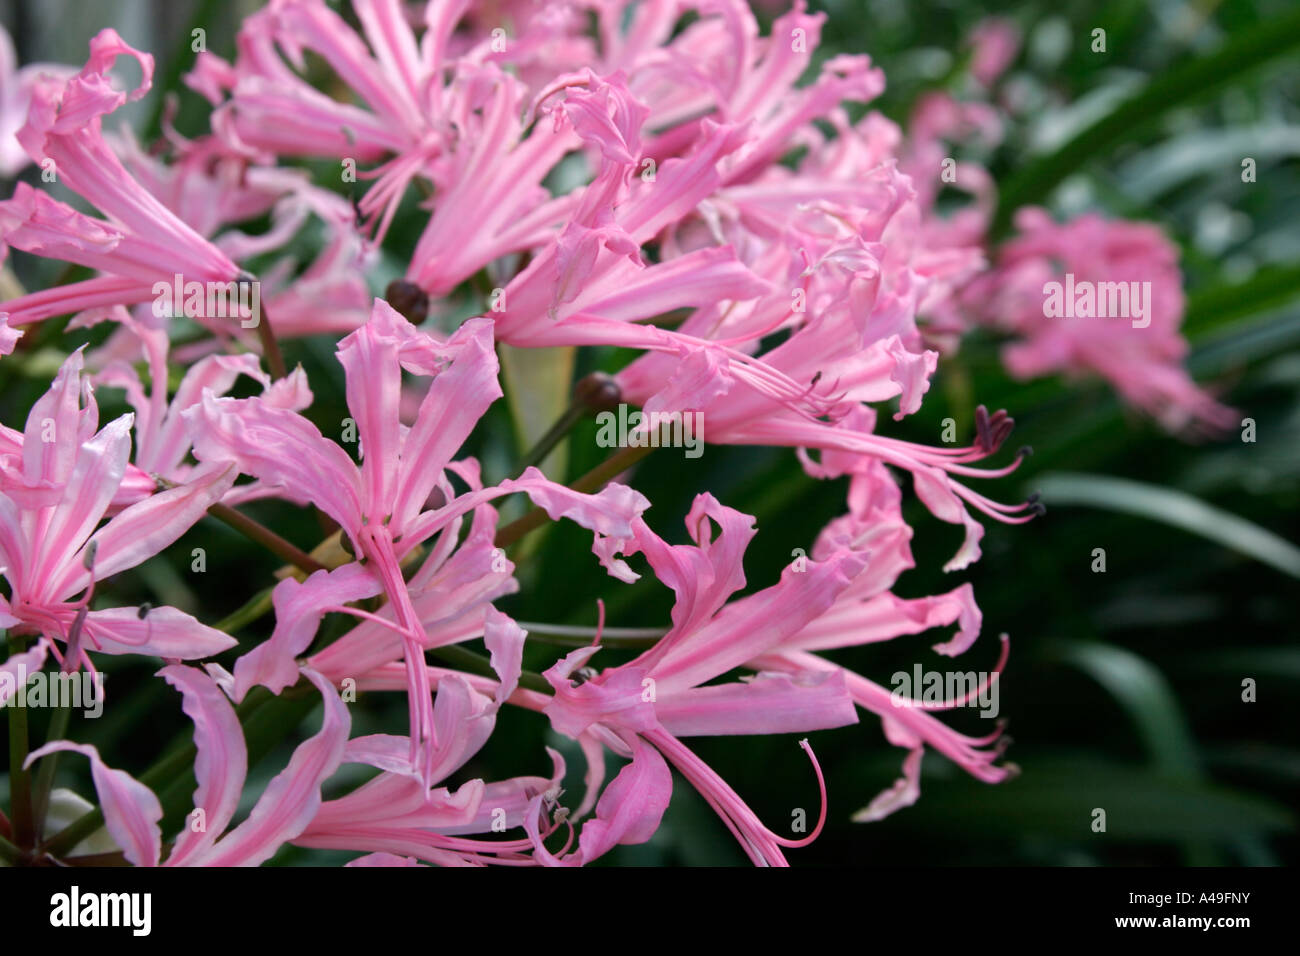 Nerine bowdenii flowers - Stock Image